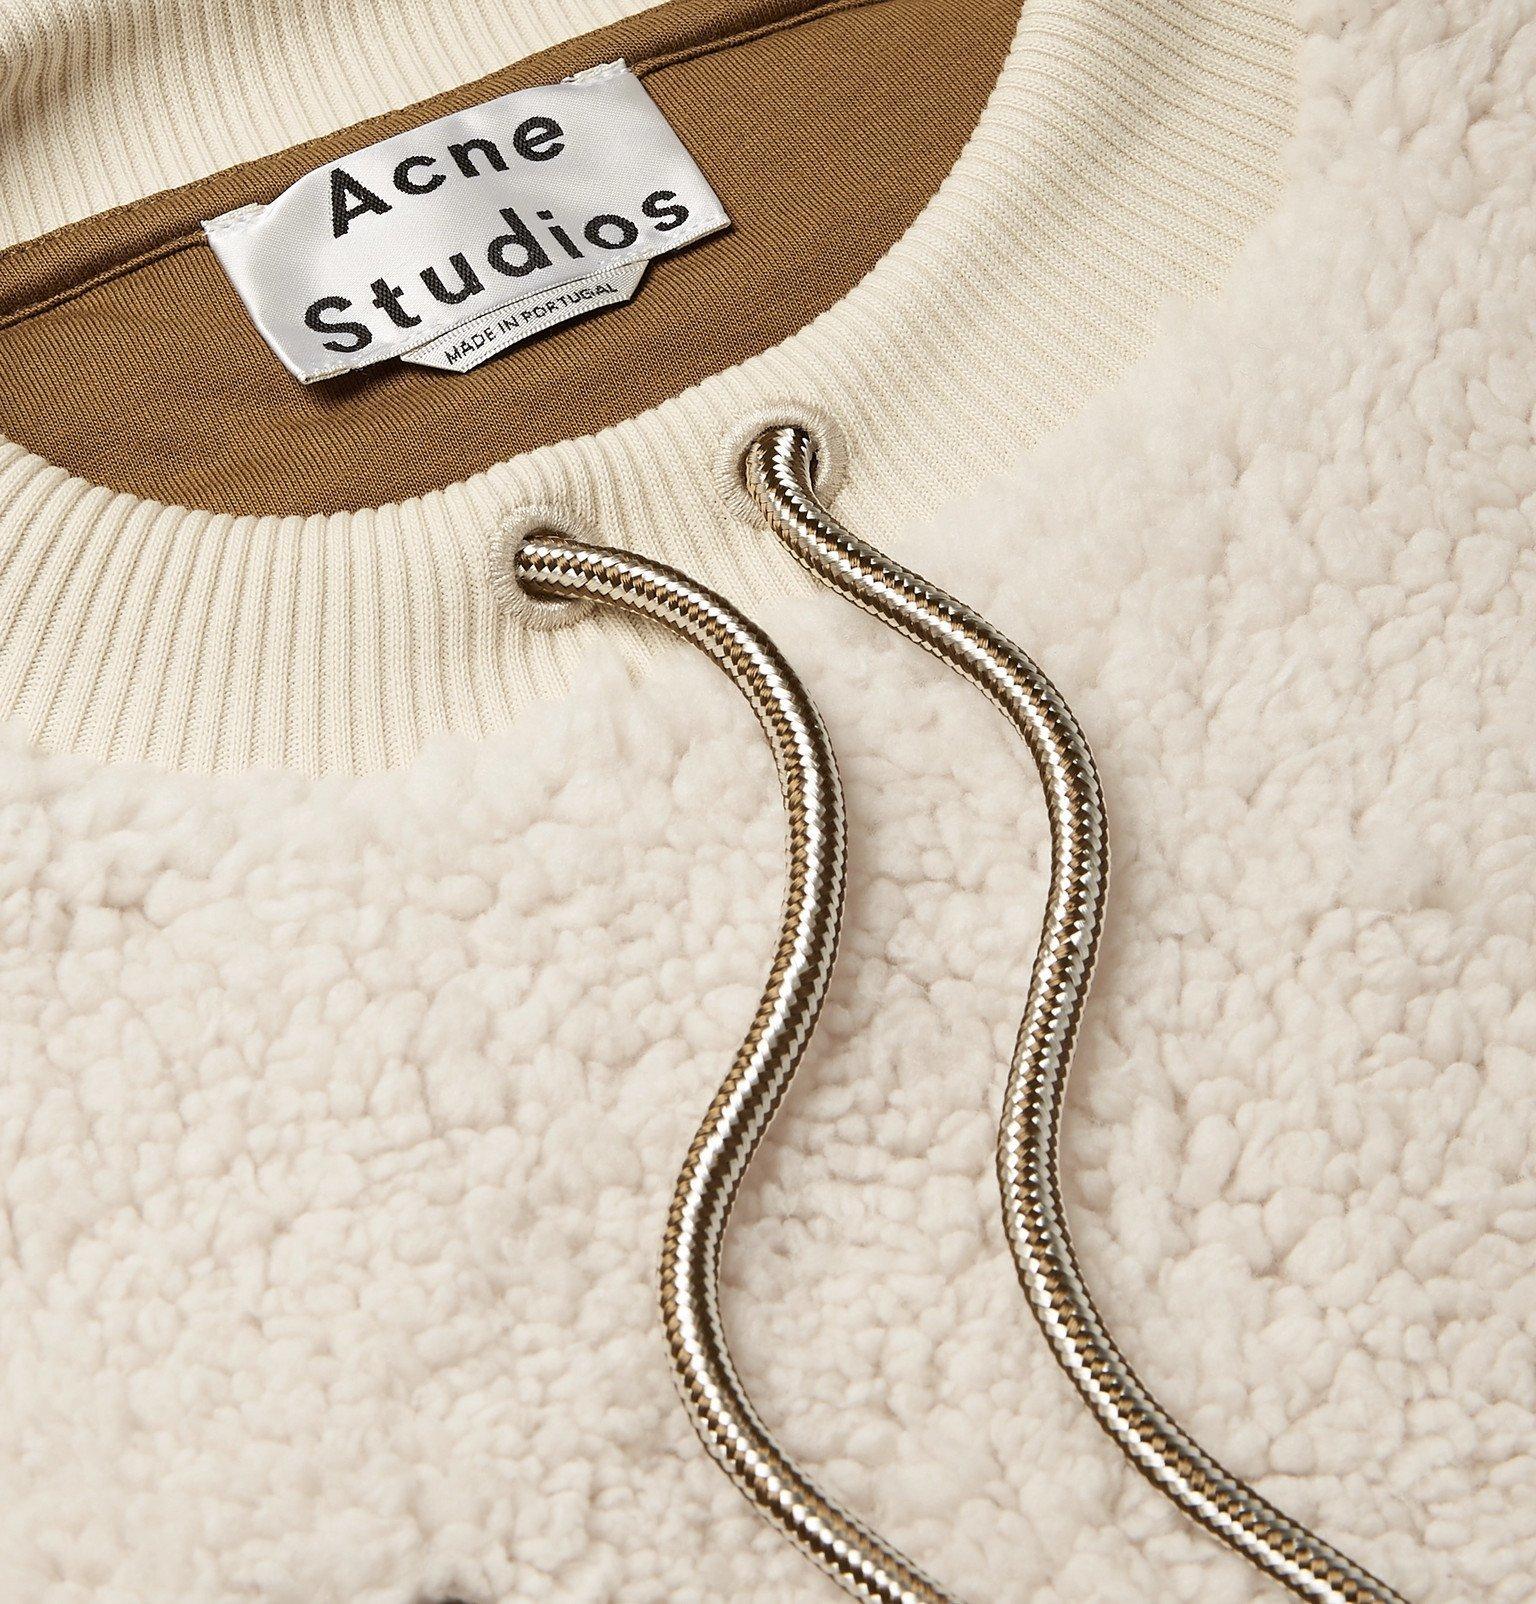 Acne Studios - Fabion Cotton Canvas-Trimmed Fleece Sweatshirt - Neutrals